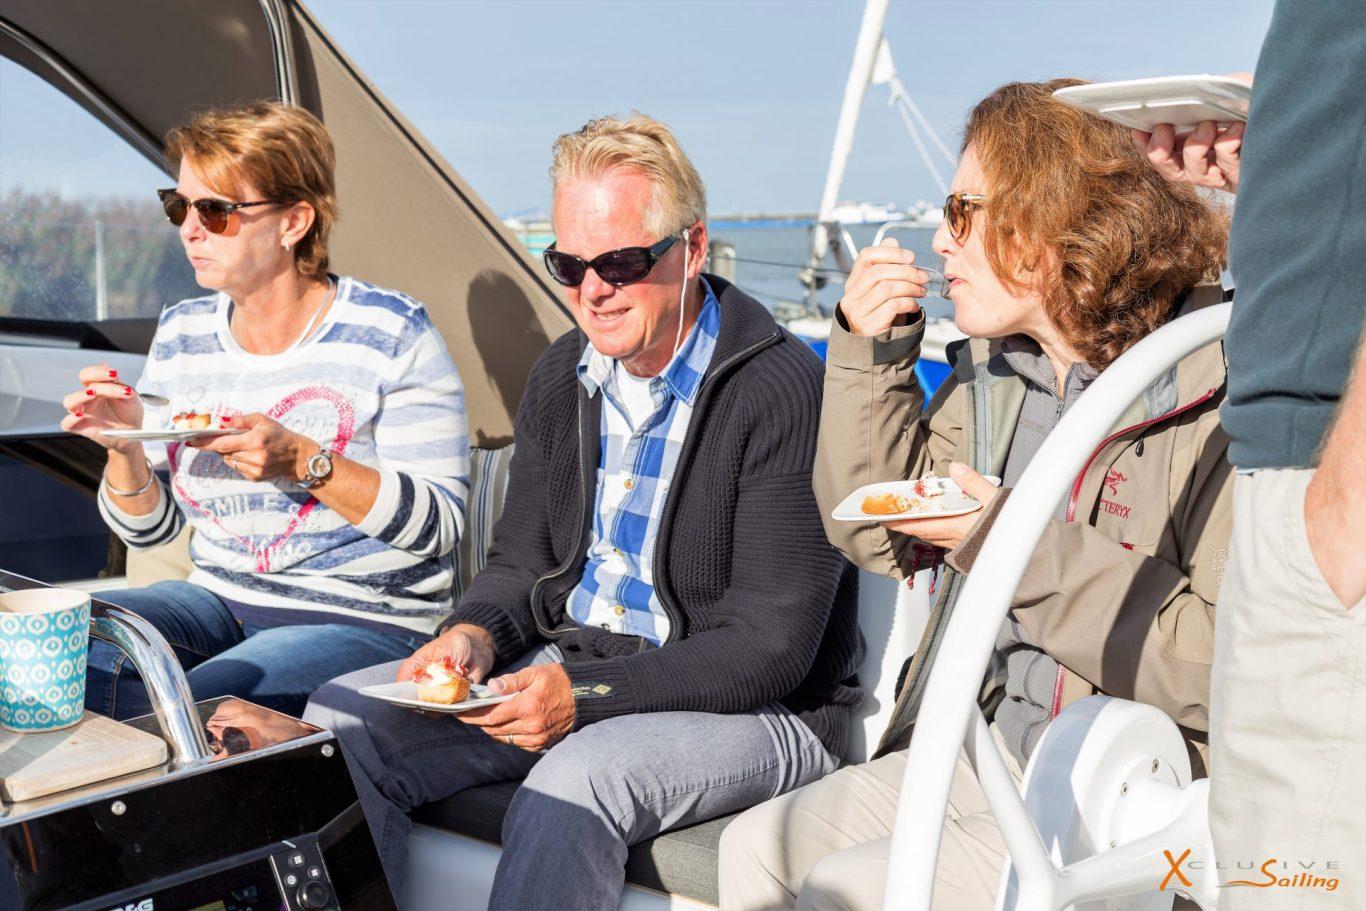 Xclusive Sailing Koffie met gebak